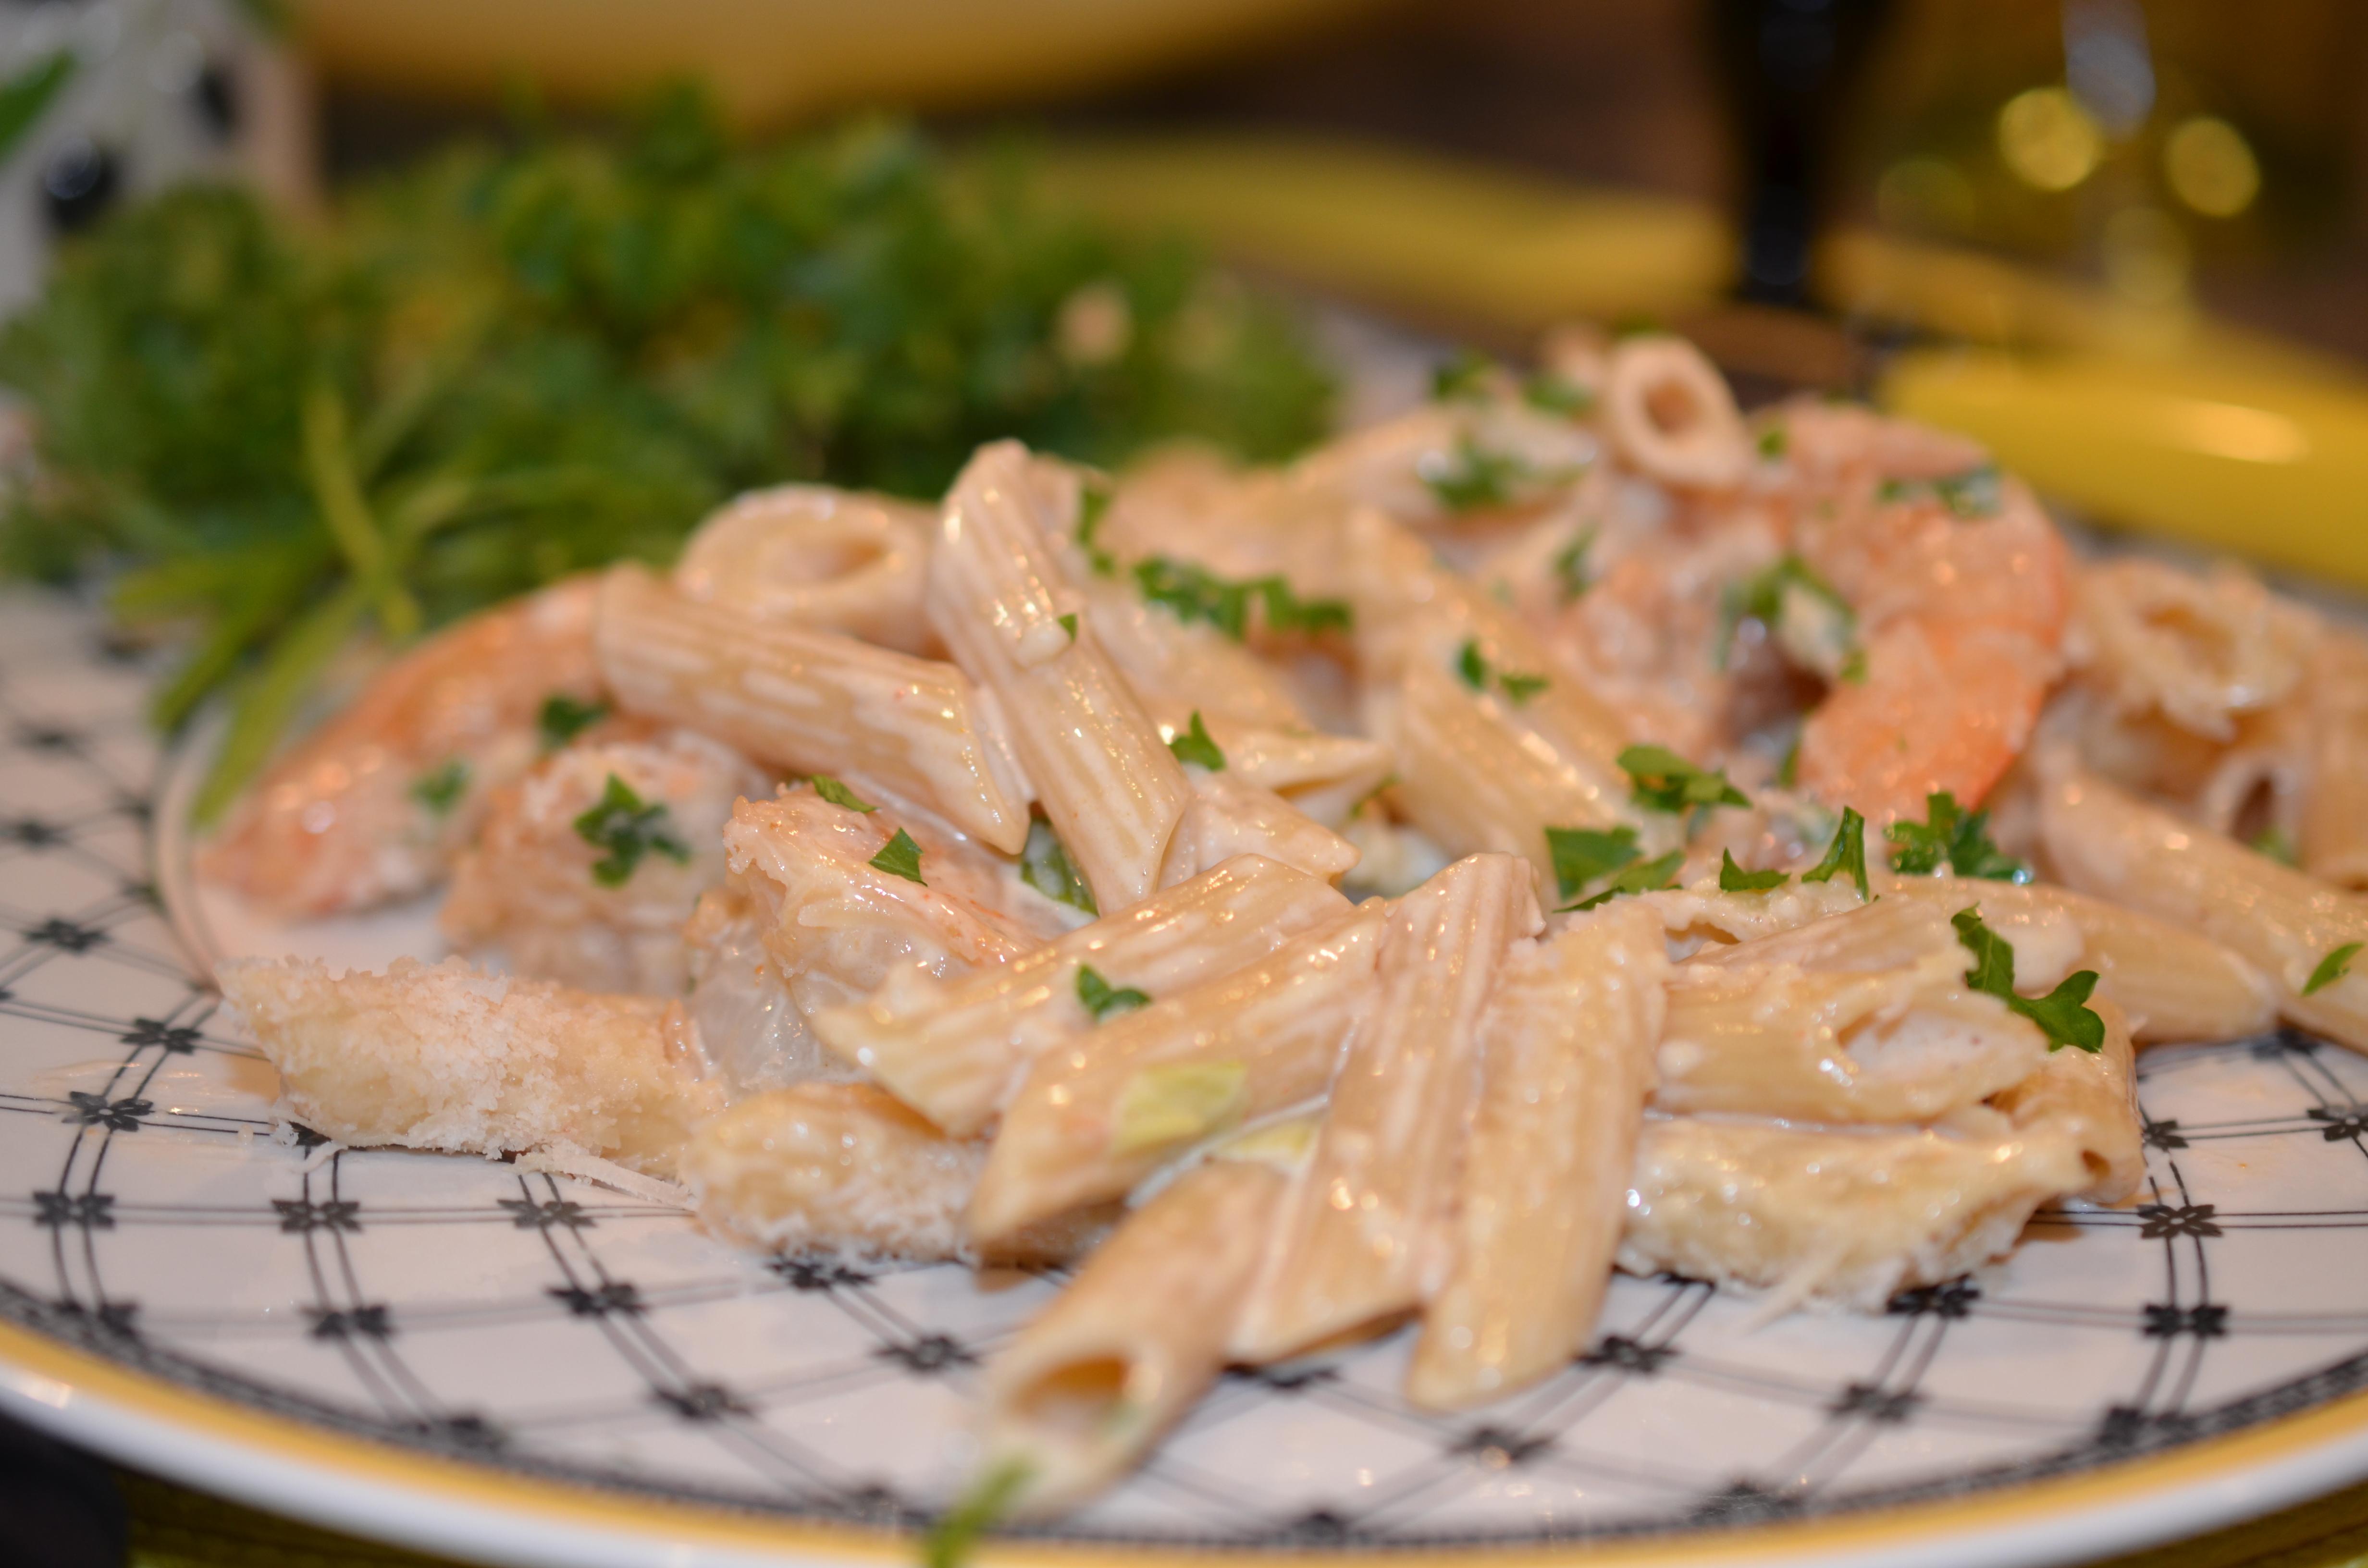 ... cookingwithauntjuju.com/2014/12/09/ shrimp-and-pas…le-cream-sauce